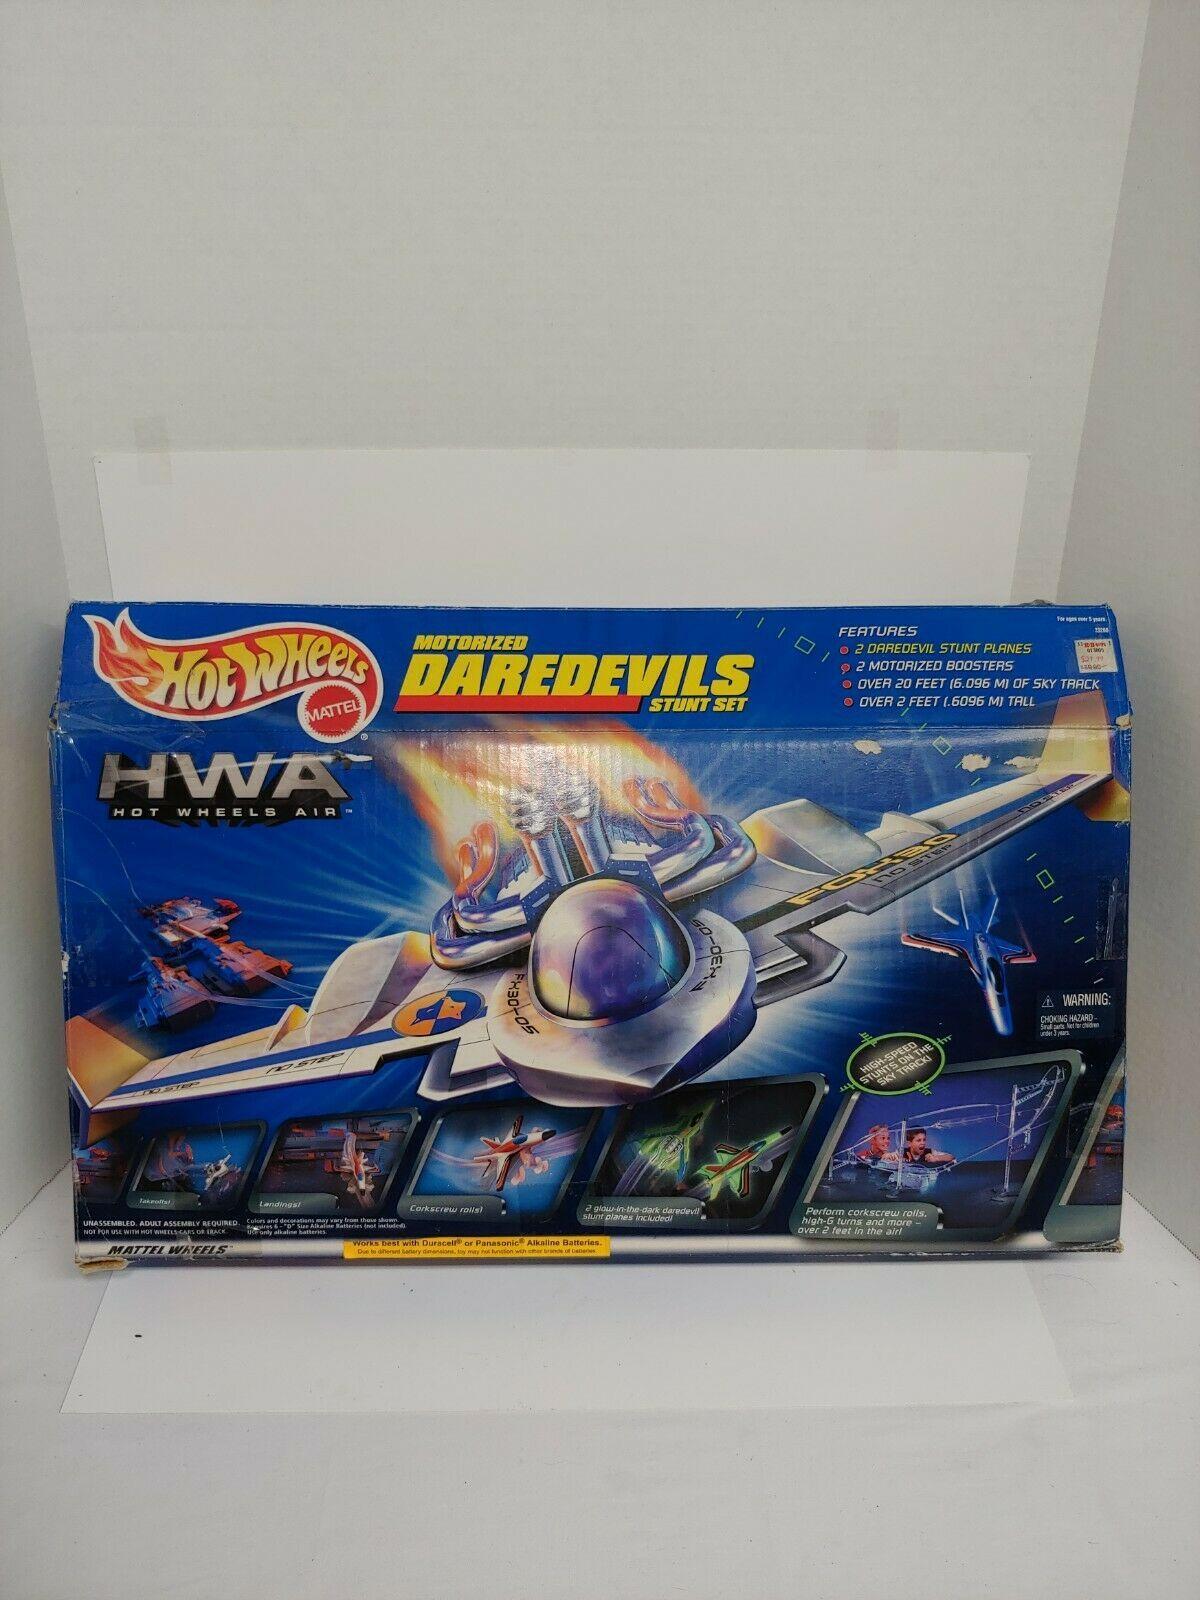 Hot Wheels HWA Motorized Daredevils Stunt Set Hot Wheels Air Mattel 1999 - $54.44